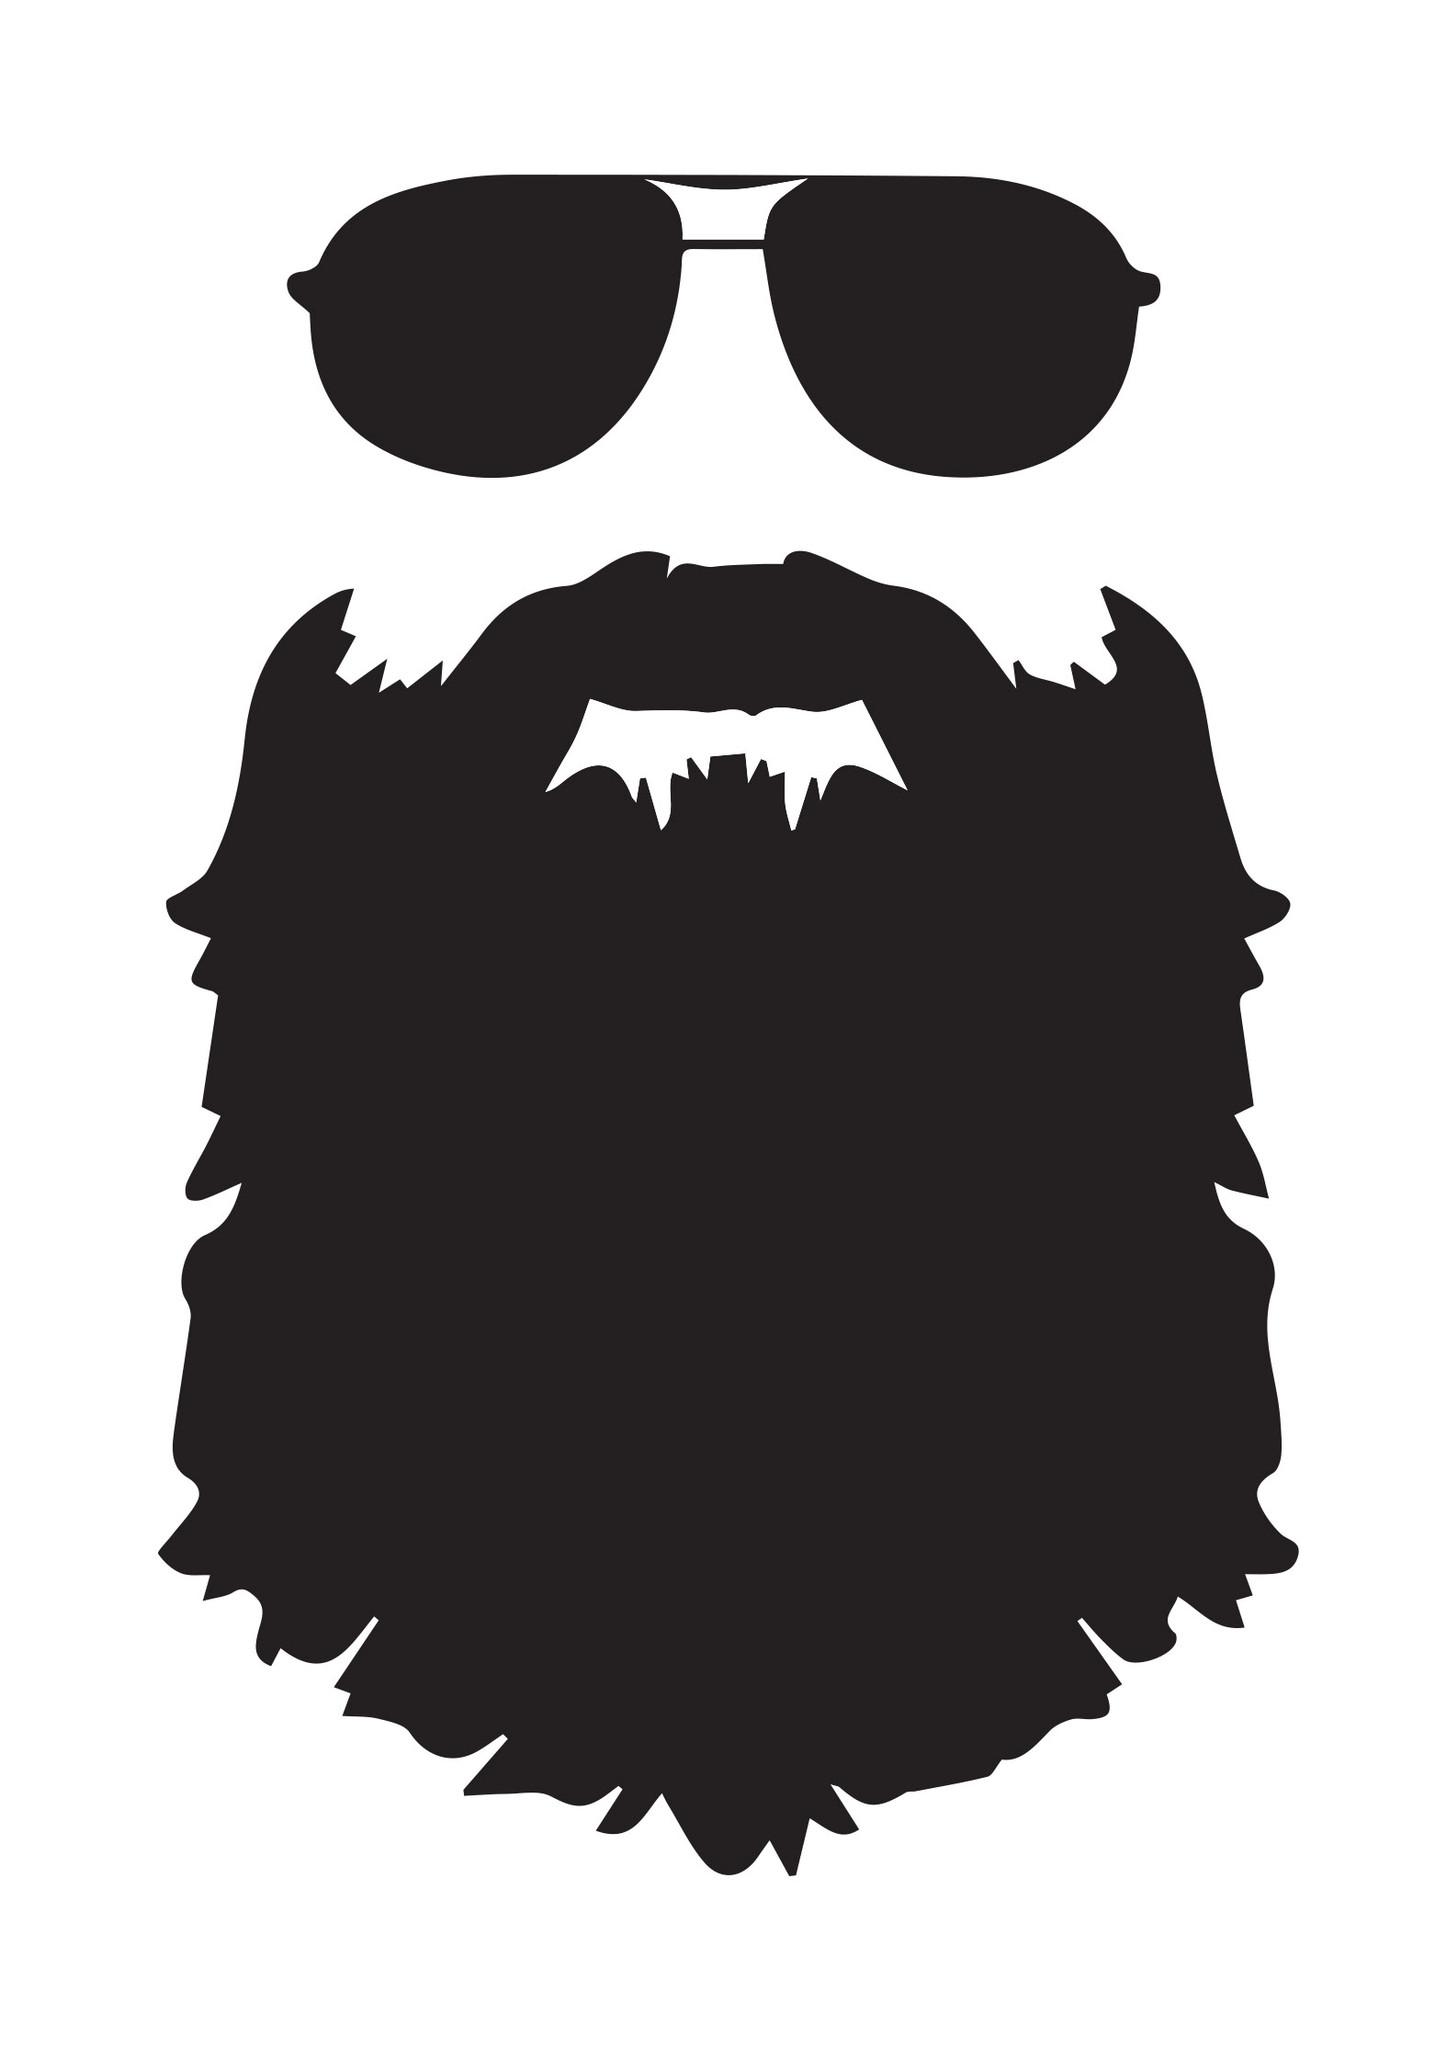 Harvest brings bonhomie & beards back to Bot River ...